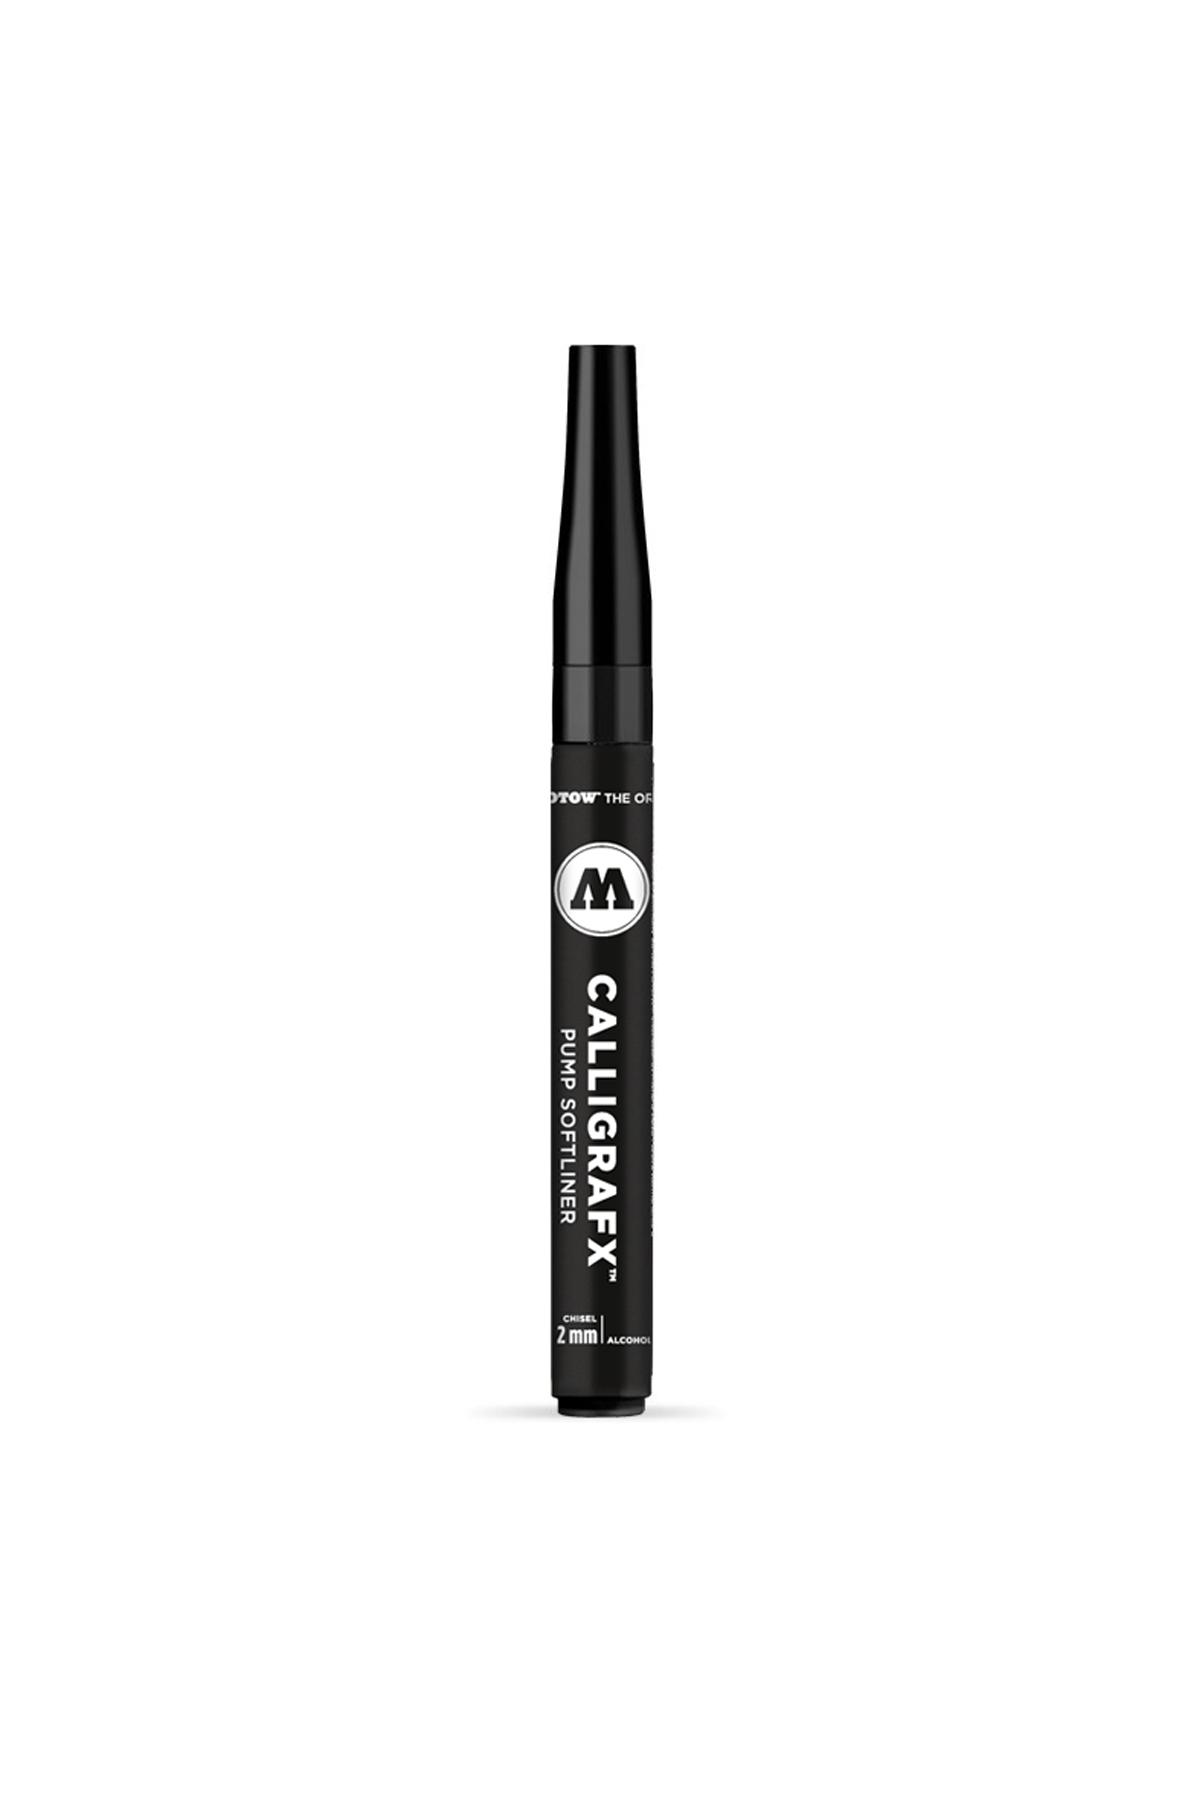 Molotow CALLIGRAFX SOFTLINER Marker 2mm